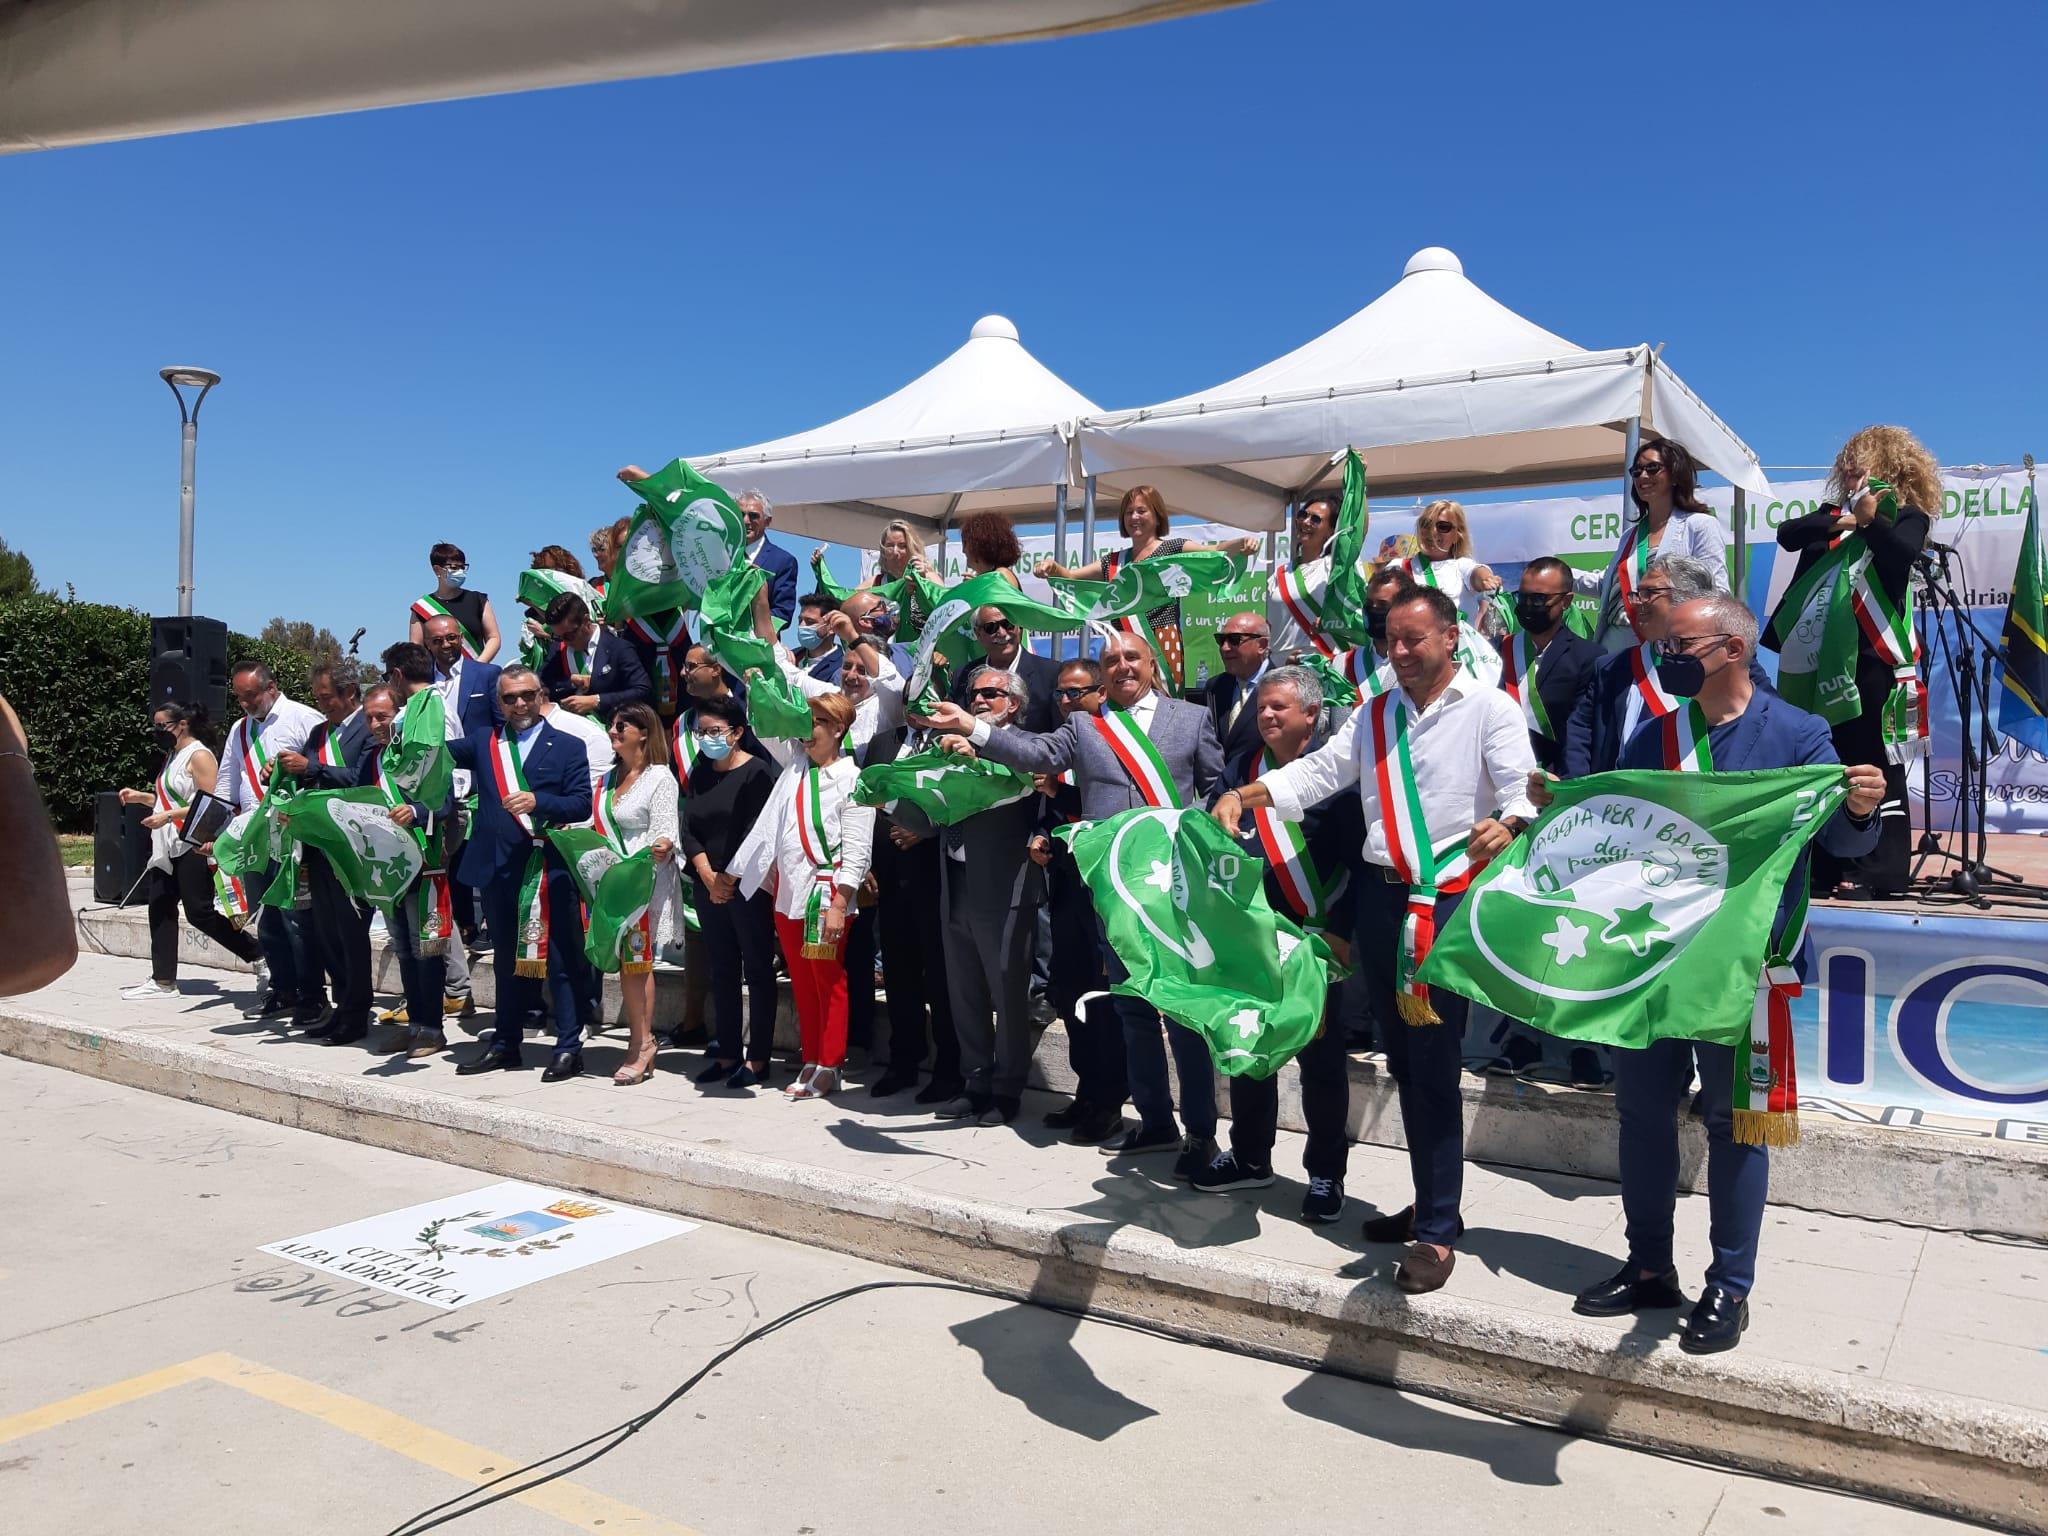 """Bandiera verde 2021"", conferma per Punta Secca, Casuzze e Caucana"